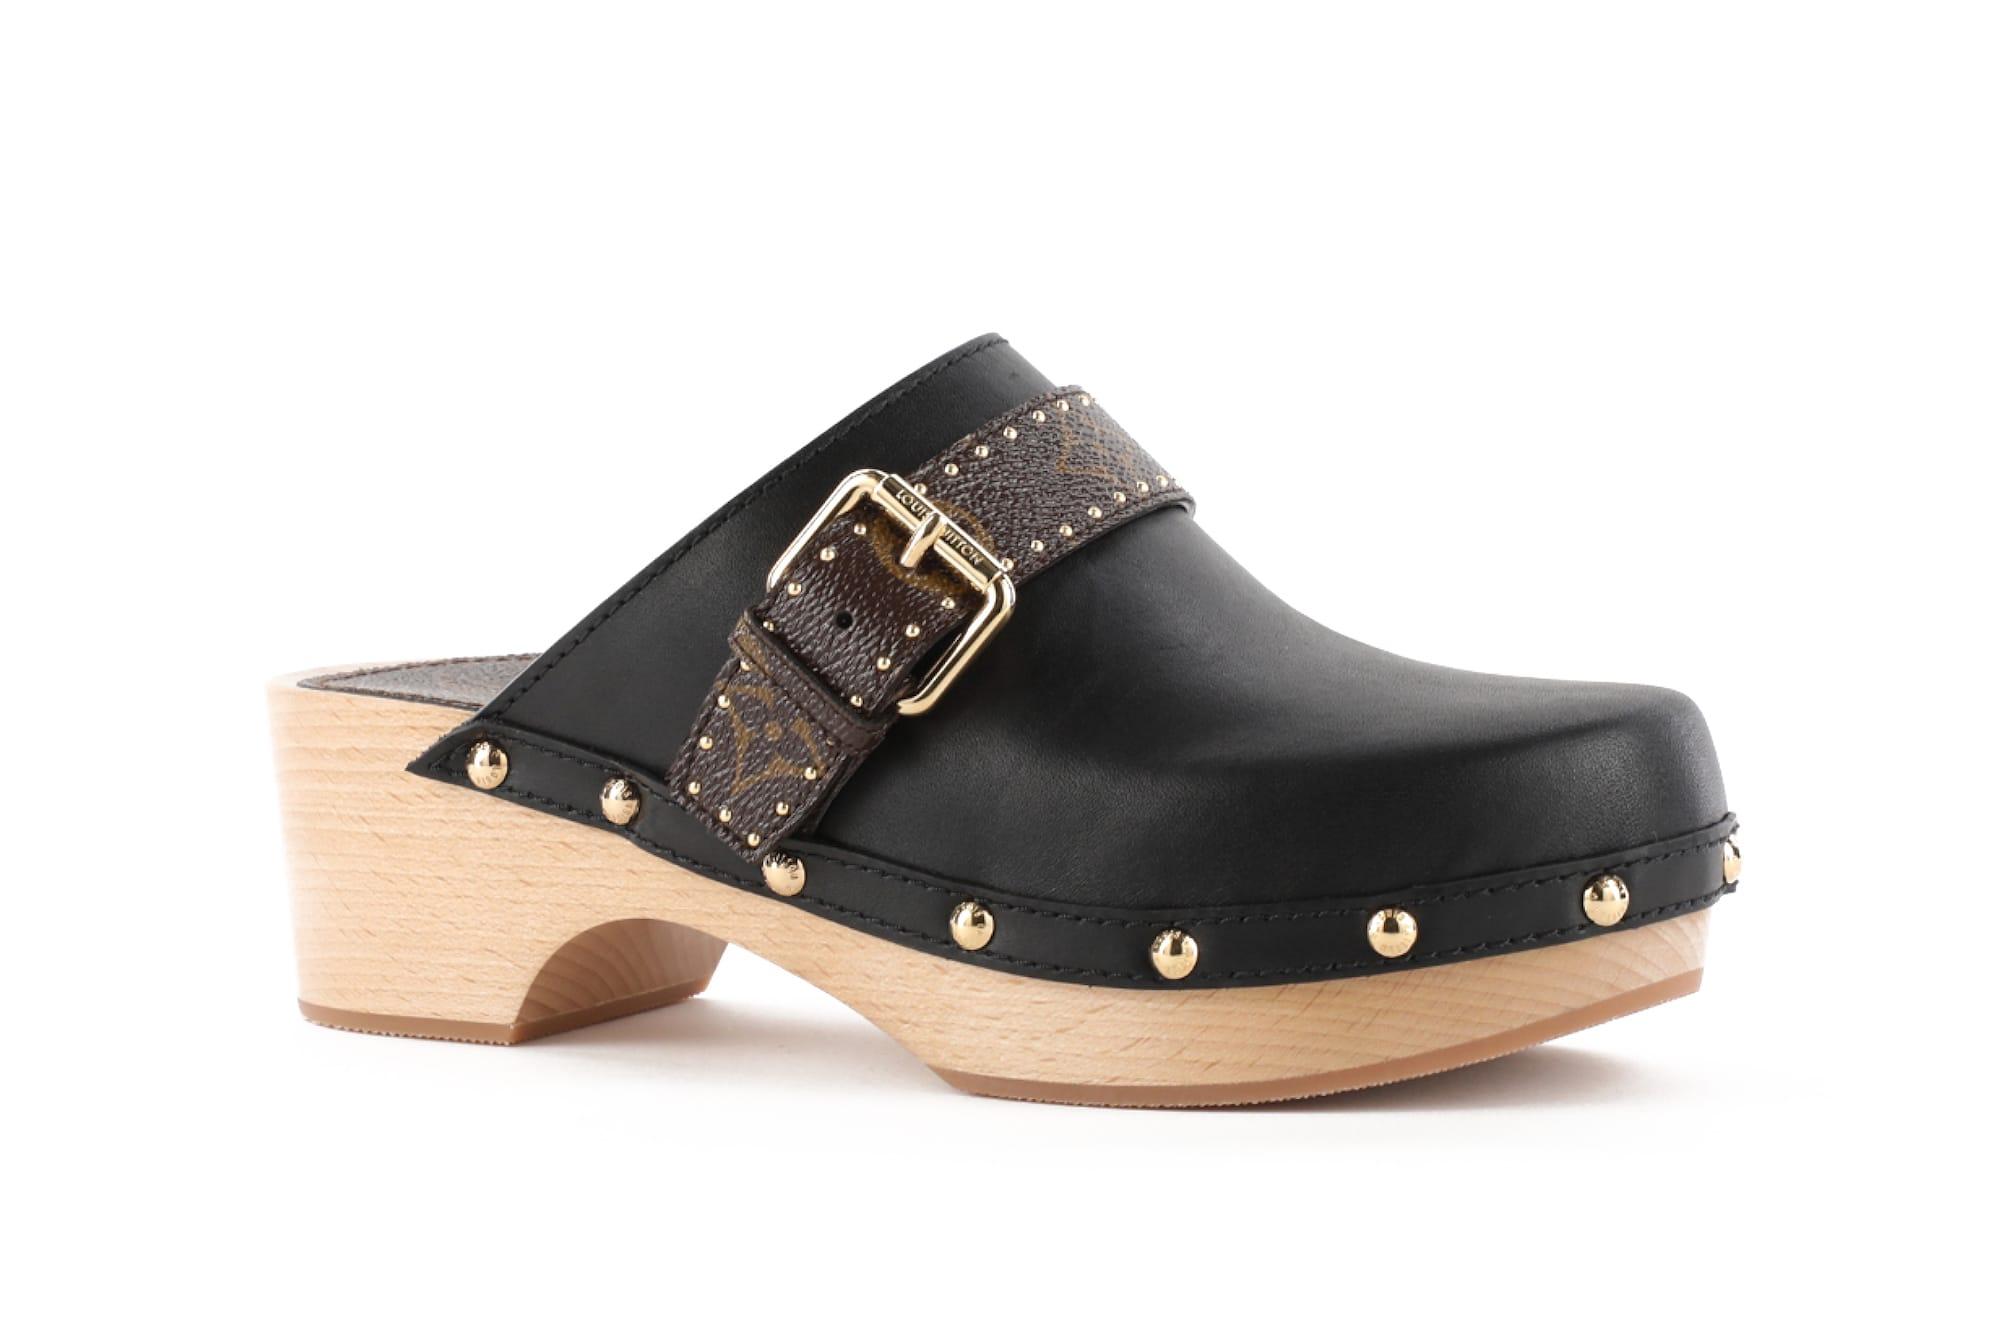 Louis Vuitton Luxury Leather Clogs